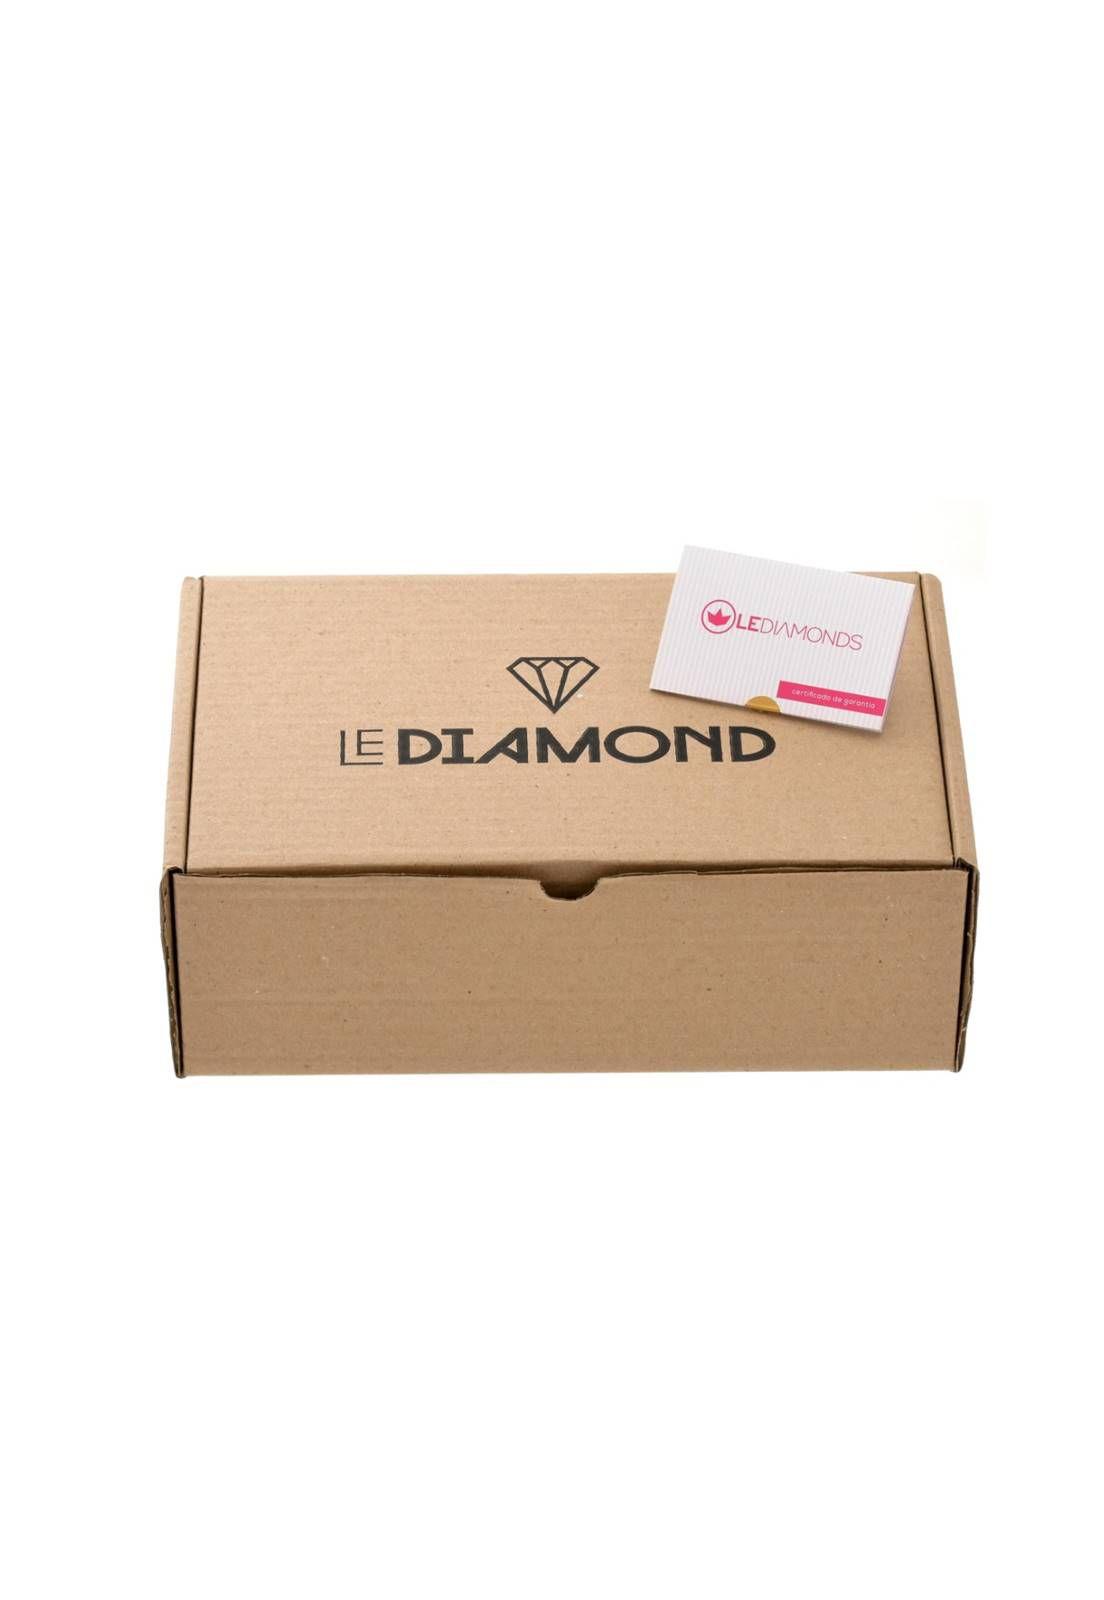 Brinco Le Diamond Turco Bijoux Dourado